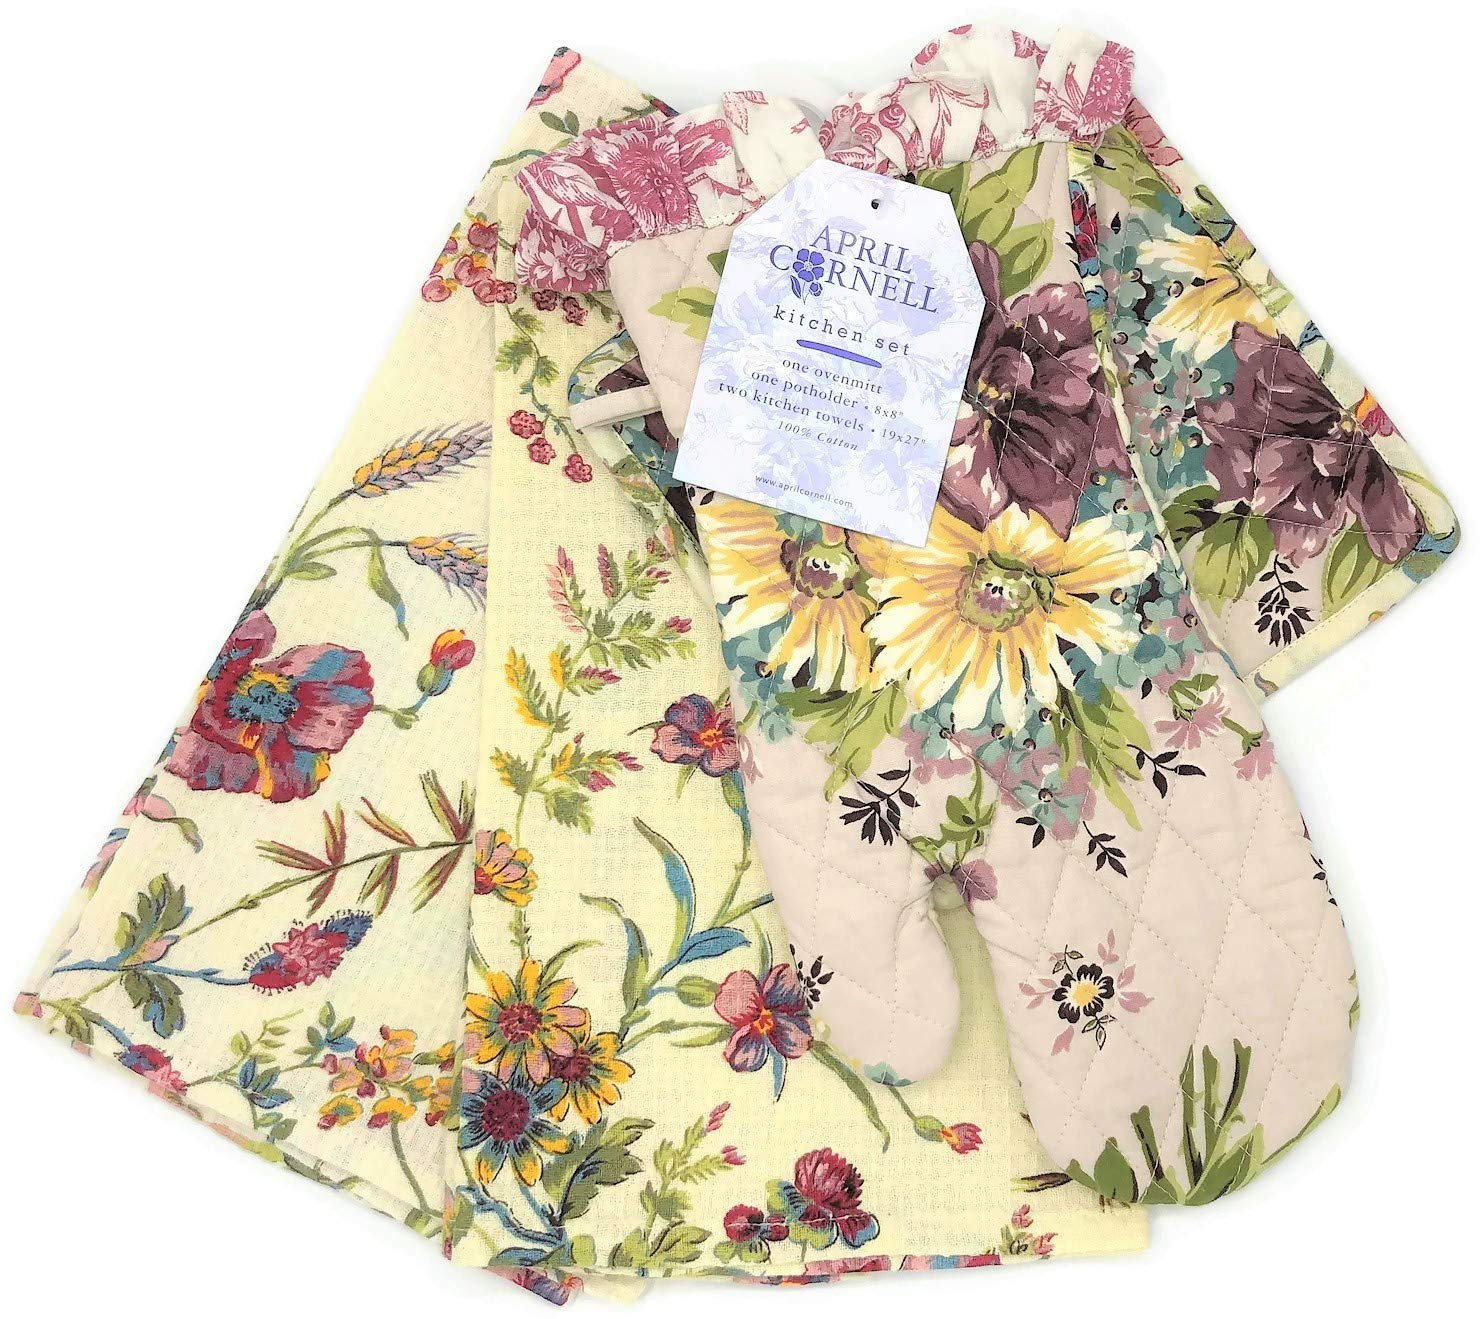 April Cornell Plum Floral Oven Mitt, Potholder, Two Towels Kitchen Set by April Cornell